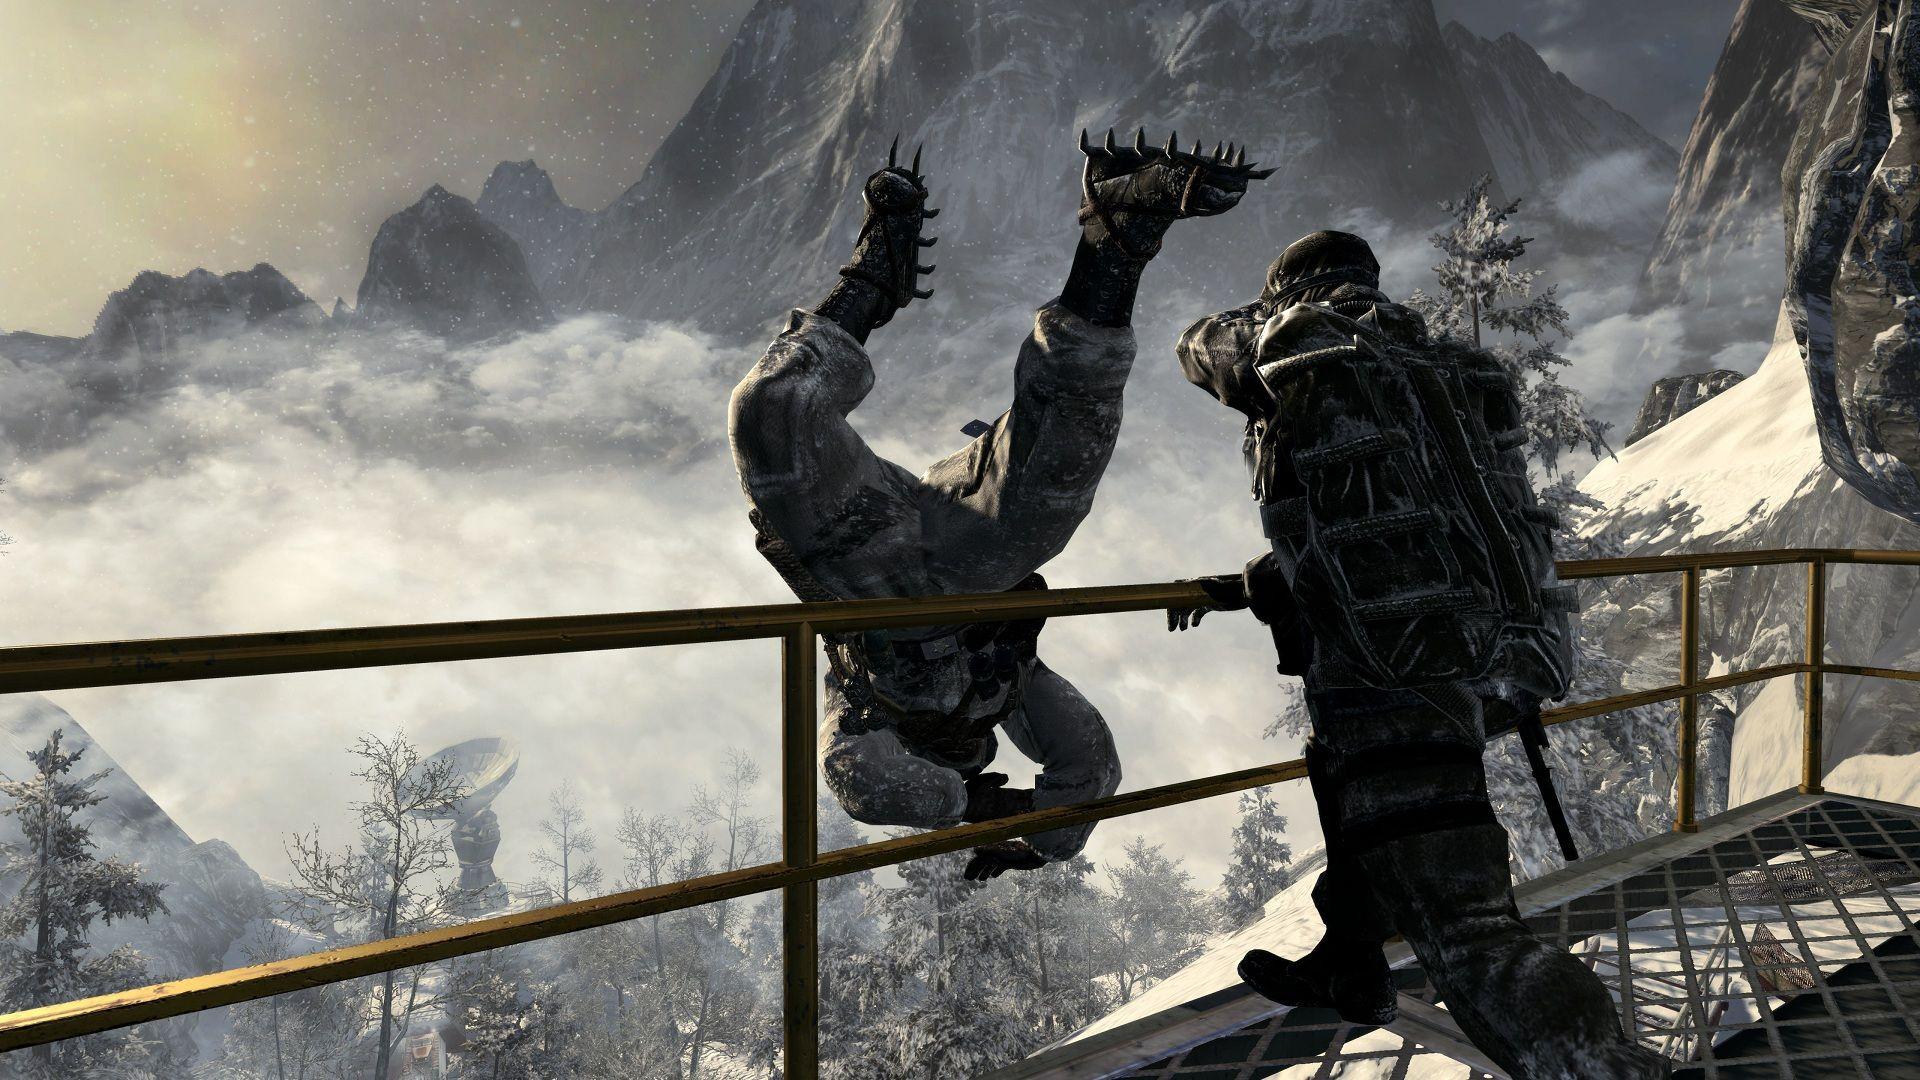 Link Tải Game Call Of Duty Black Ops Miễn Phí